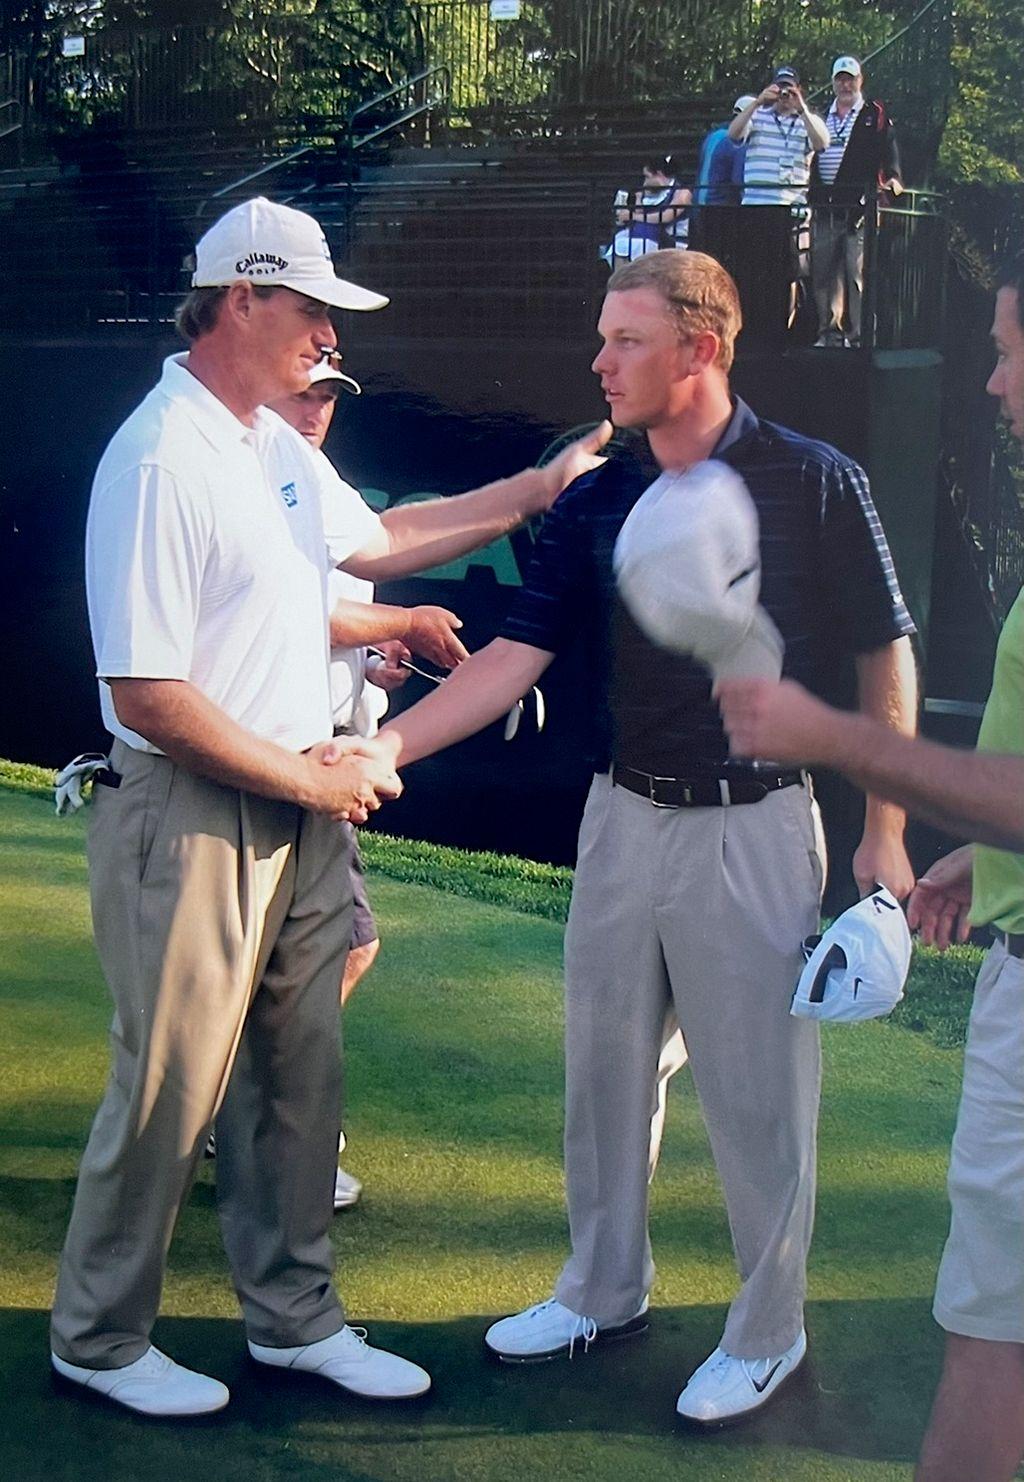 Tin Can Golf Instruction